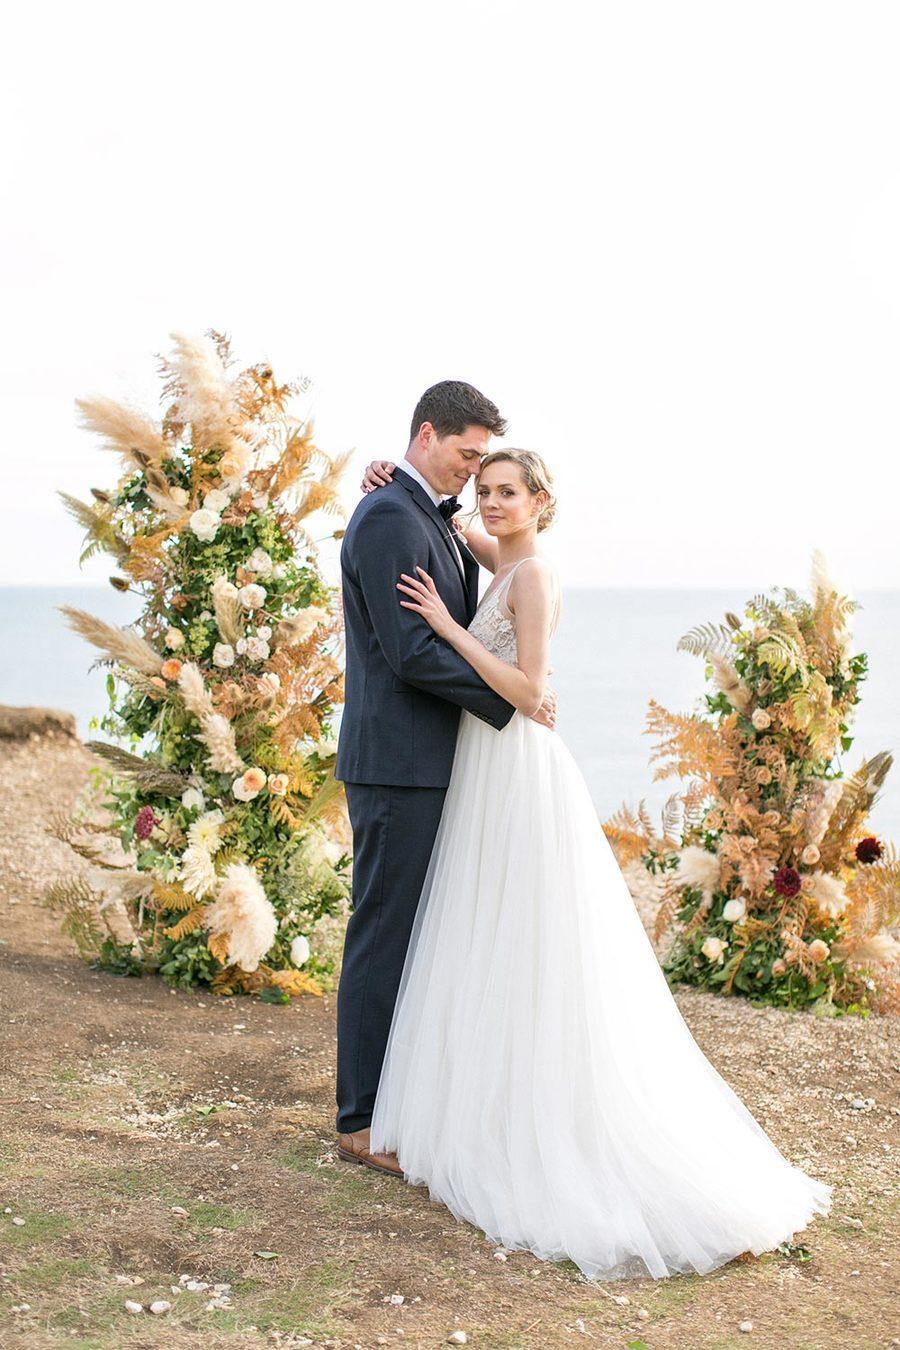 asymmetrical floral pillar wedding ceremony backdrop